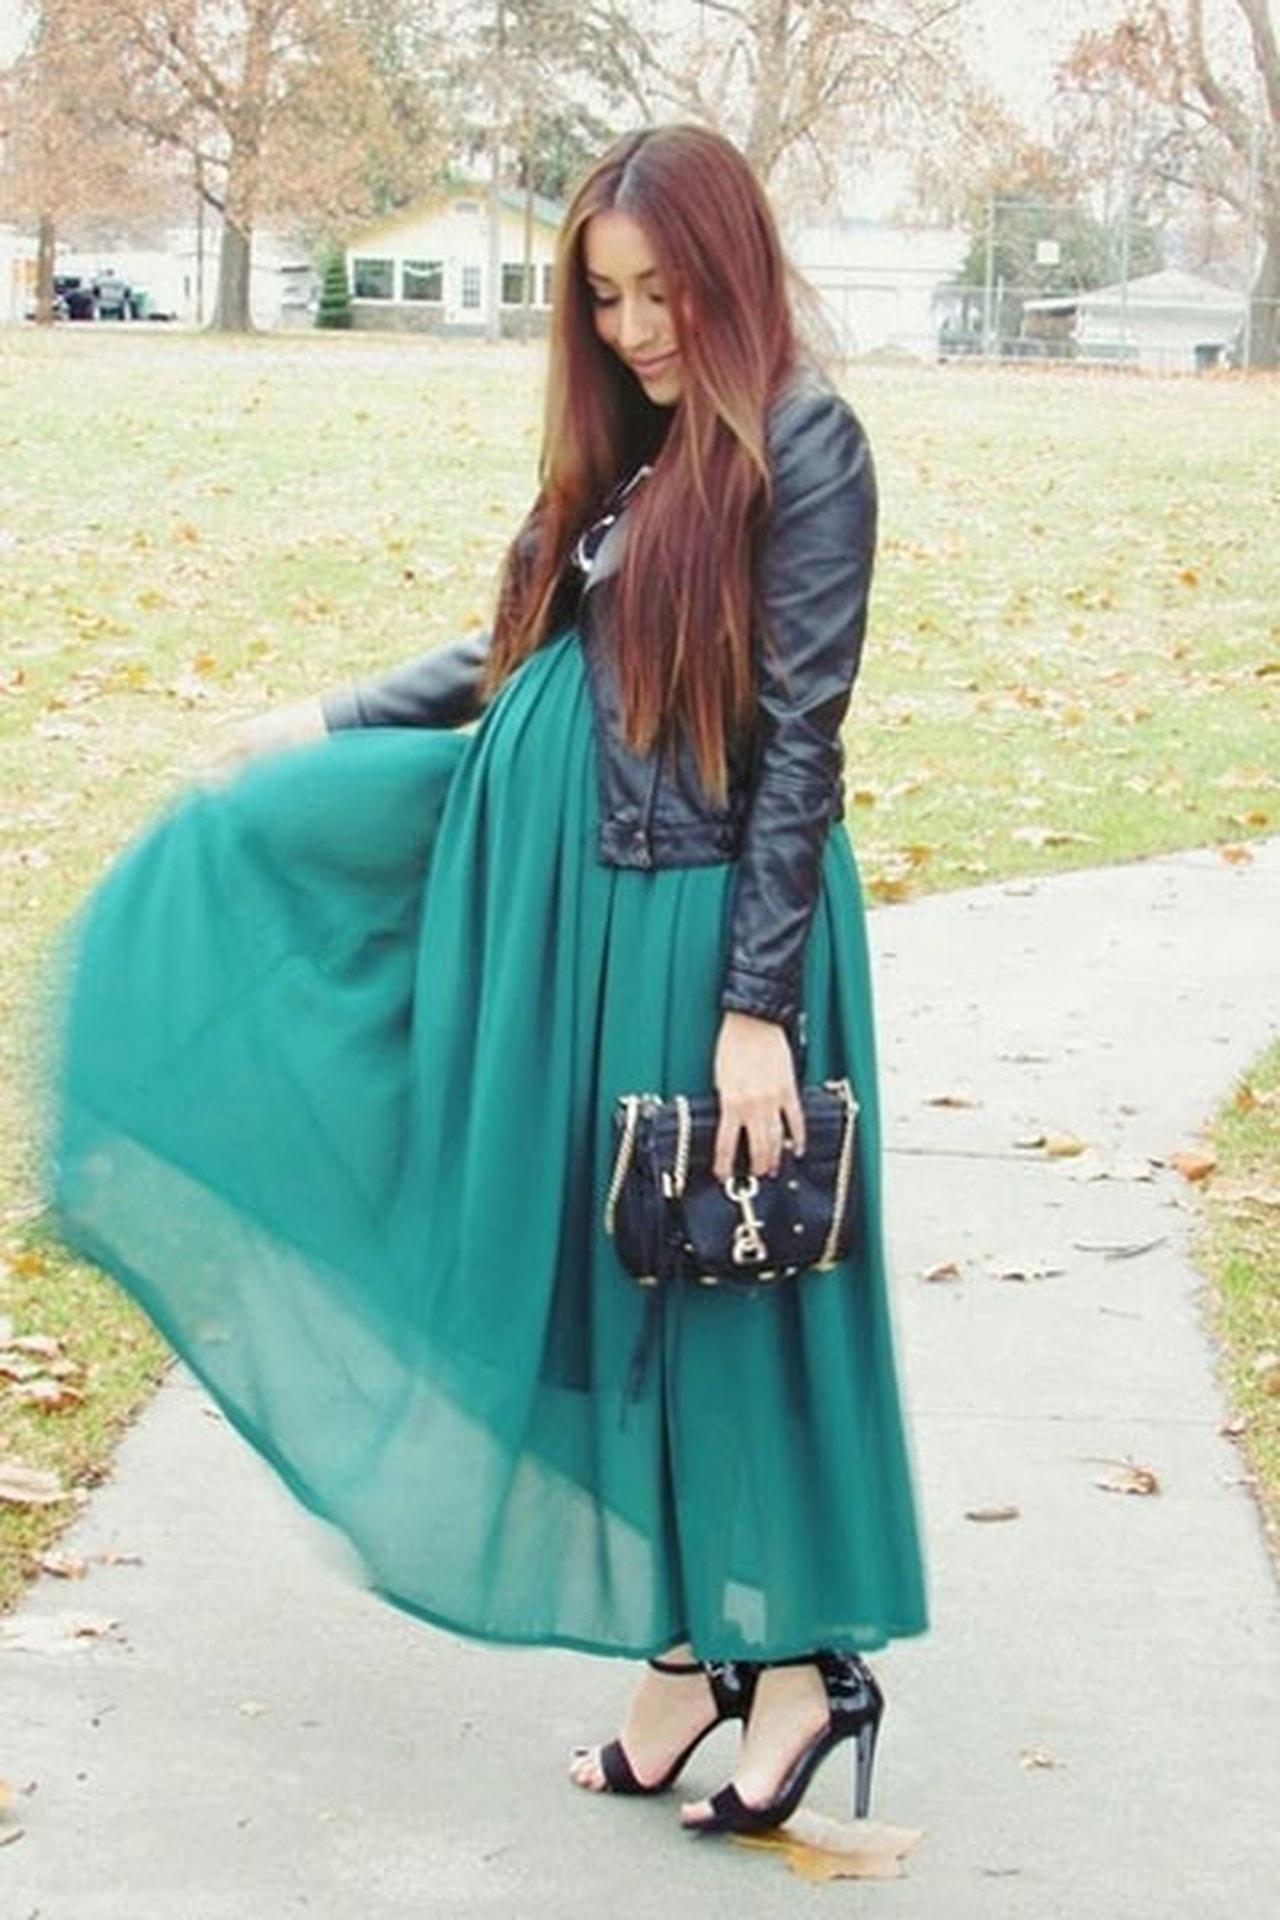 ملابس حوامل ,<p></p><br> <p></p><br>افضل ملابس الحوامل  كارز